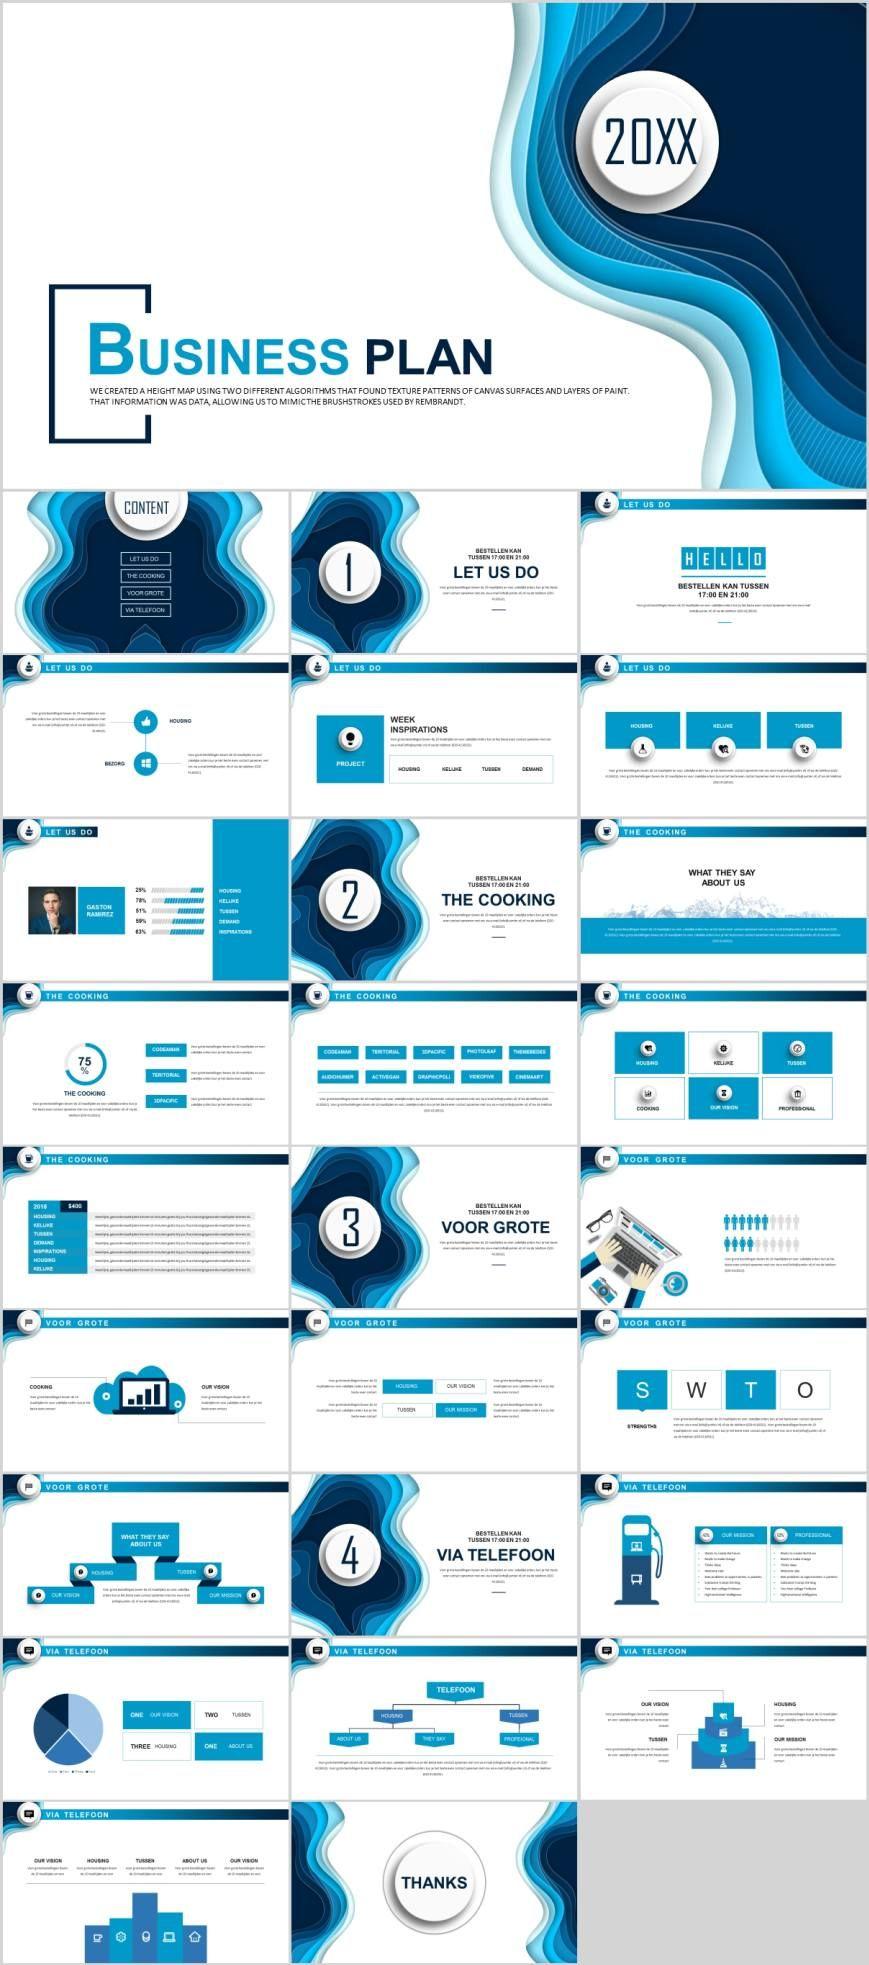 Blue business plan analysis PowerPoint template